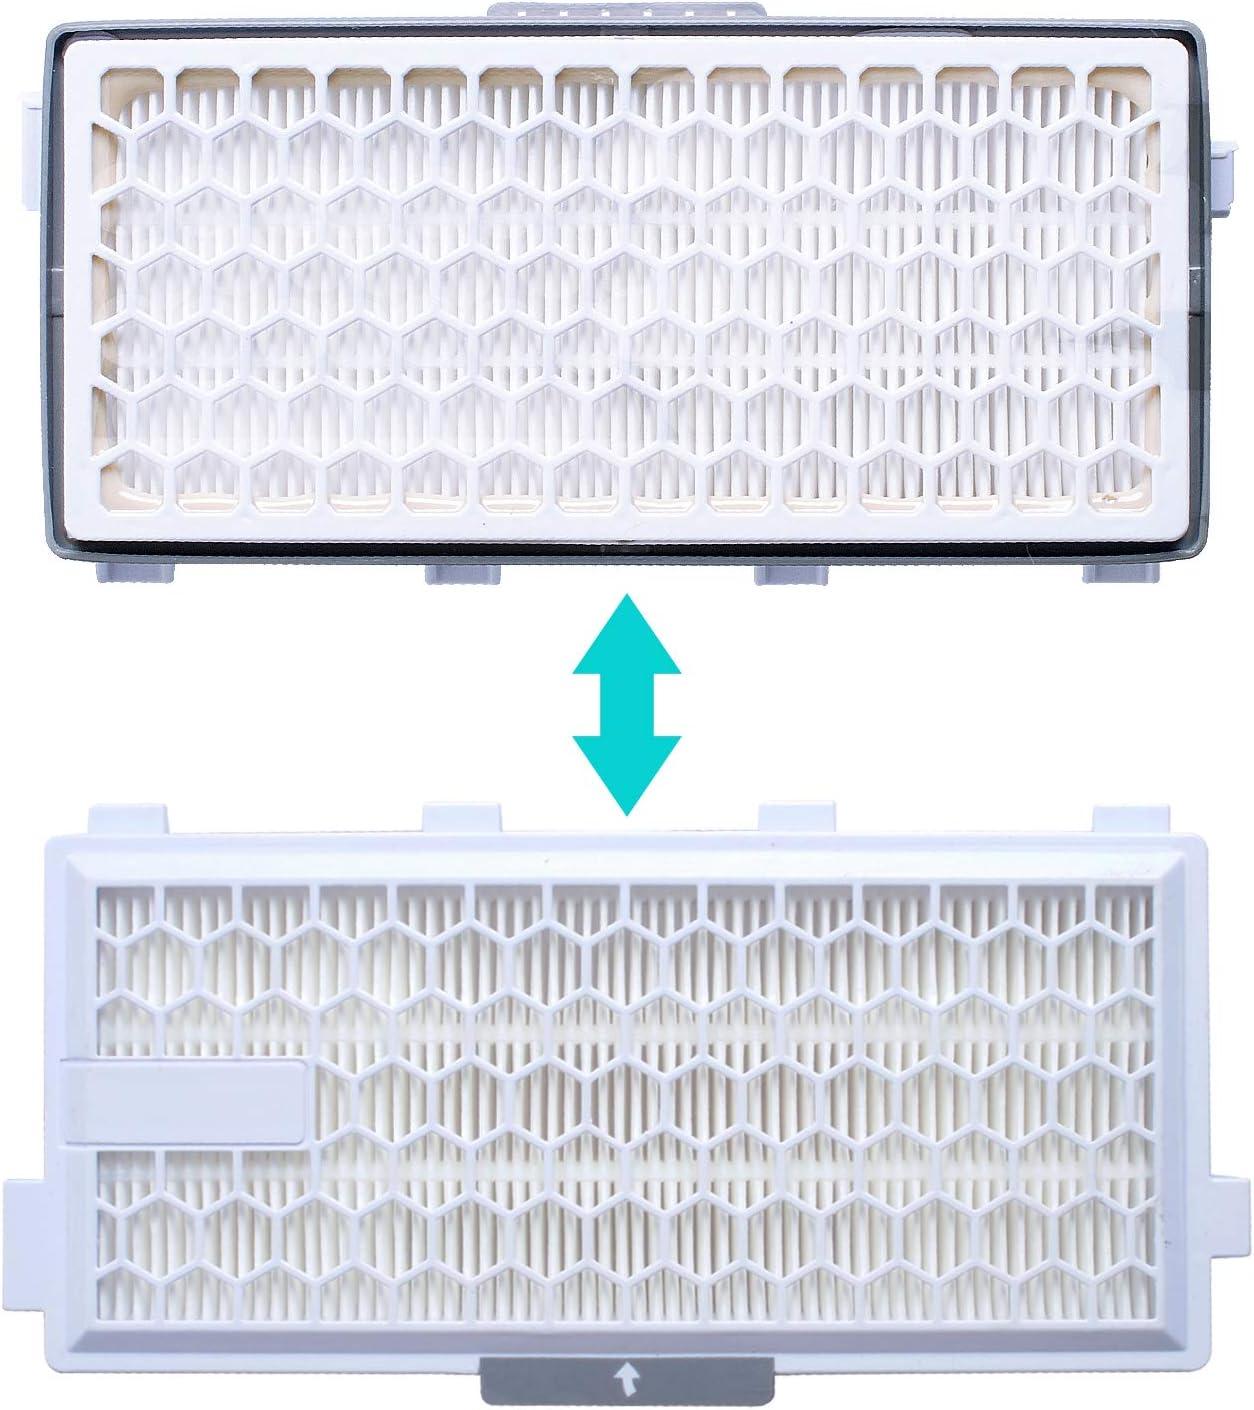 Filtro HEPA Airclean per aspirapolvere Miele serie Complete C3 C2 Compact C1 C2 S8340 S6240 S5211 S8000 S6000 S5000 S4000 Poweka SF-HA50